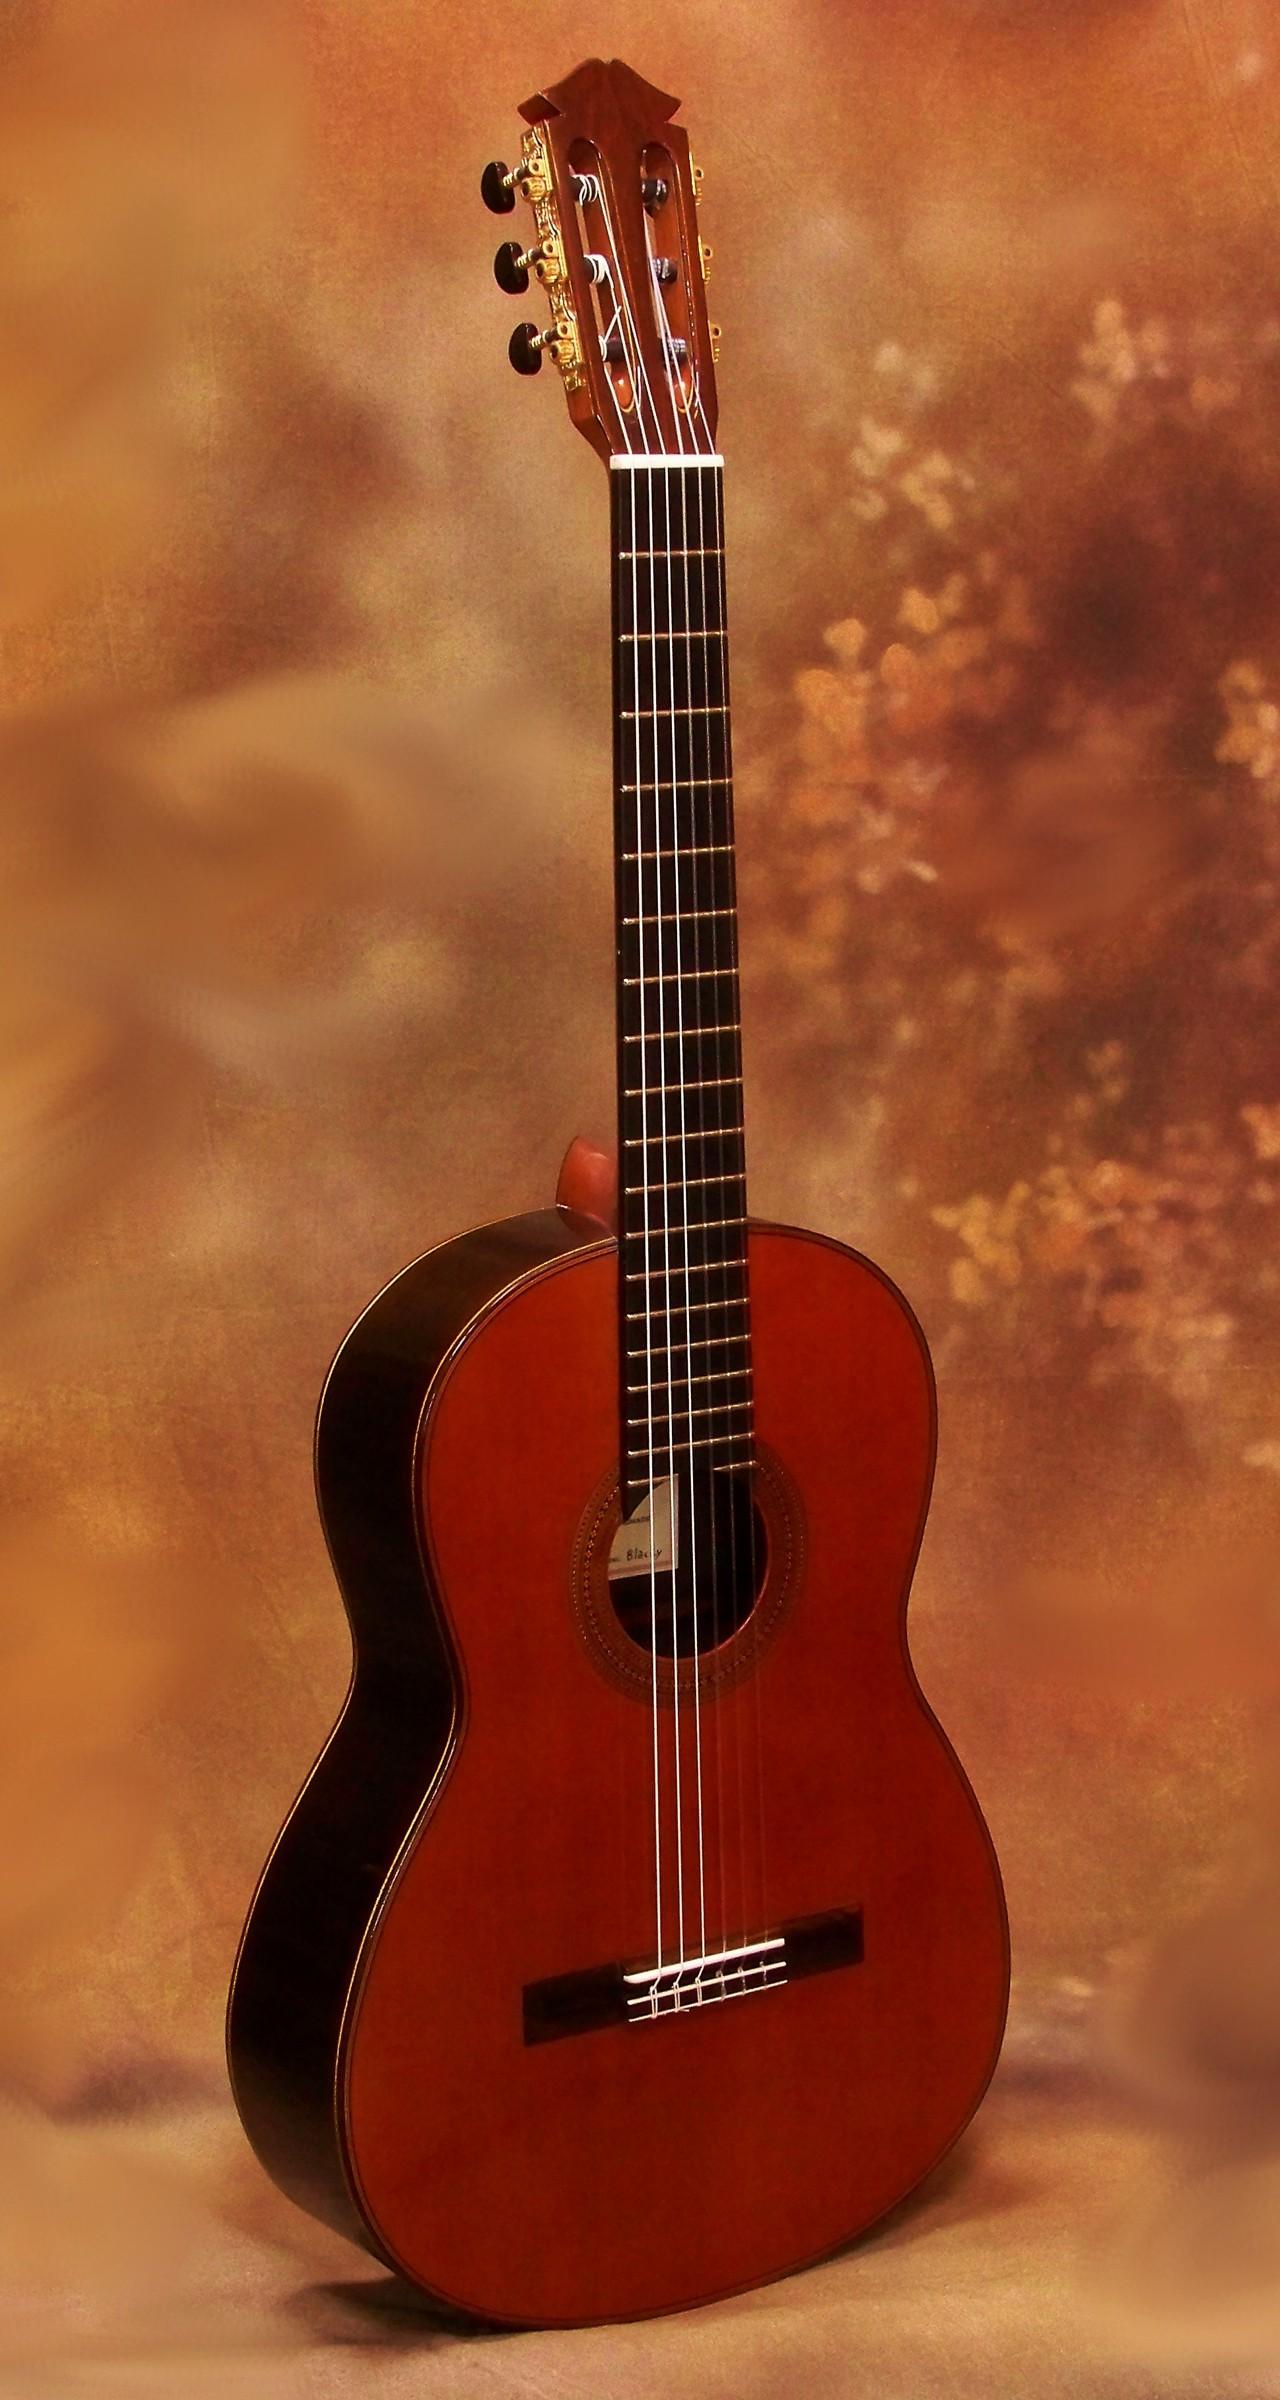 darren hippner blacky classical guitar 694 savage classical guitar. Black Bedroom Furniture Sets. Home Design Ideas